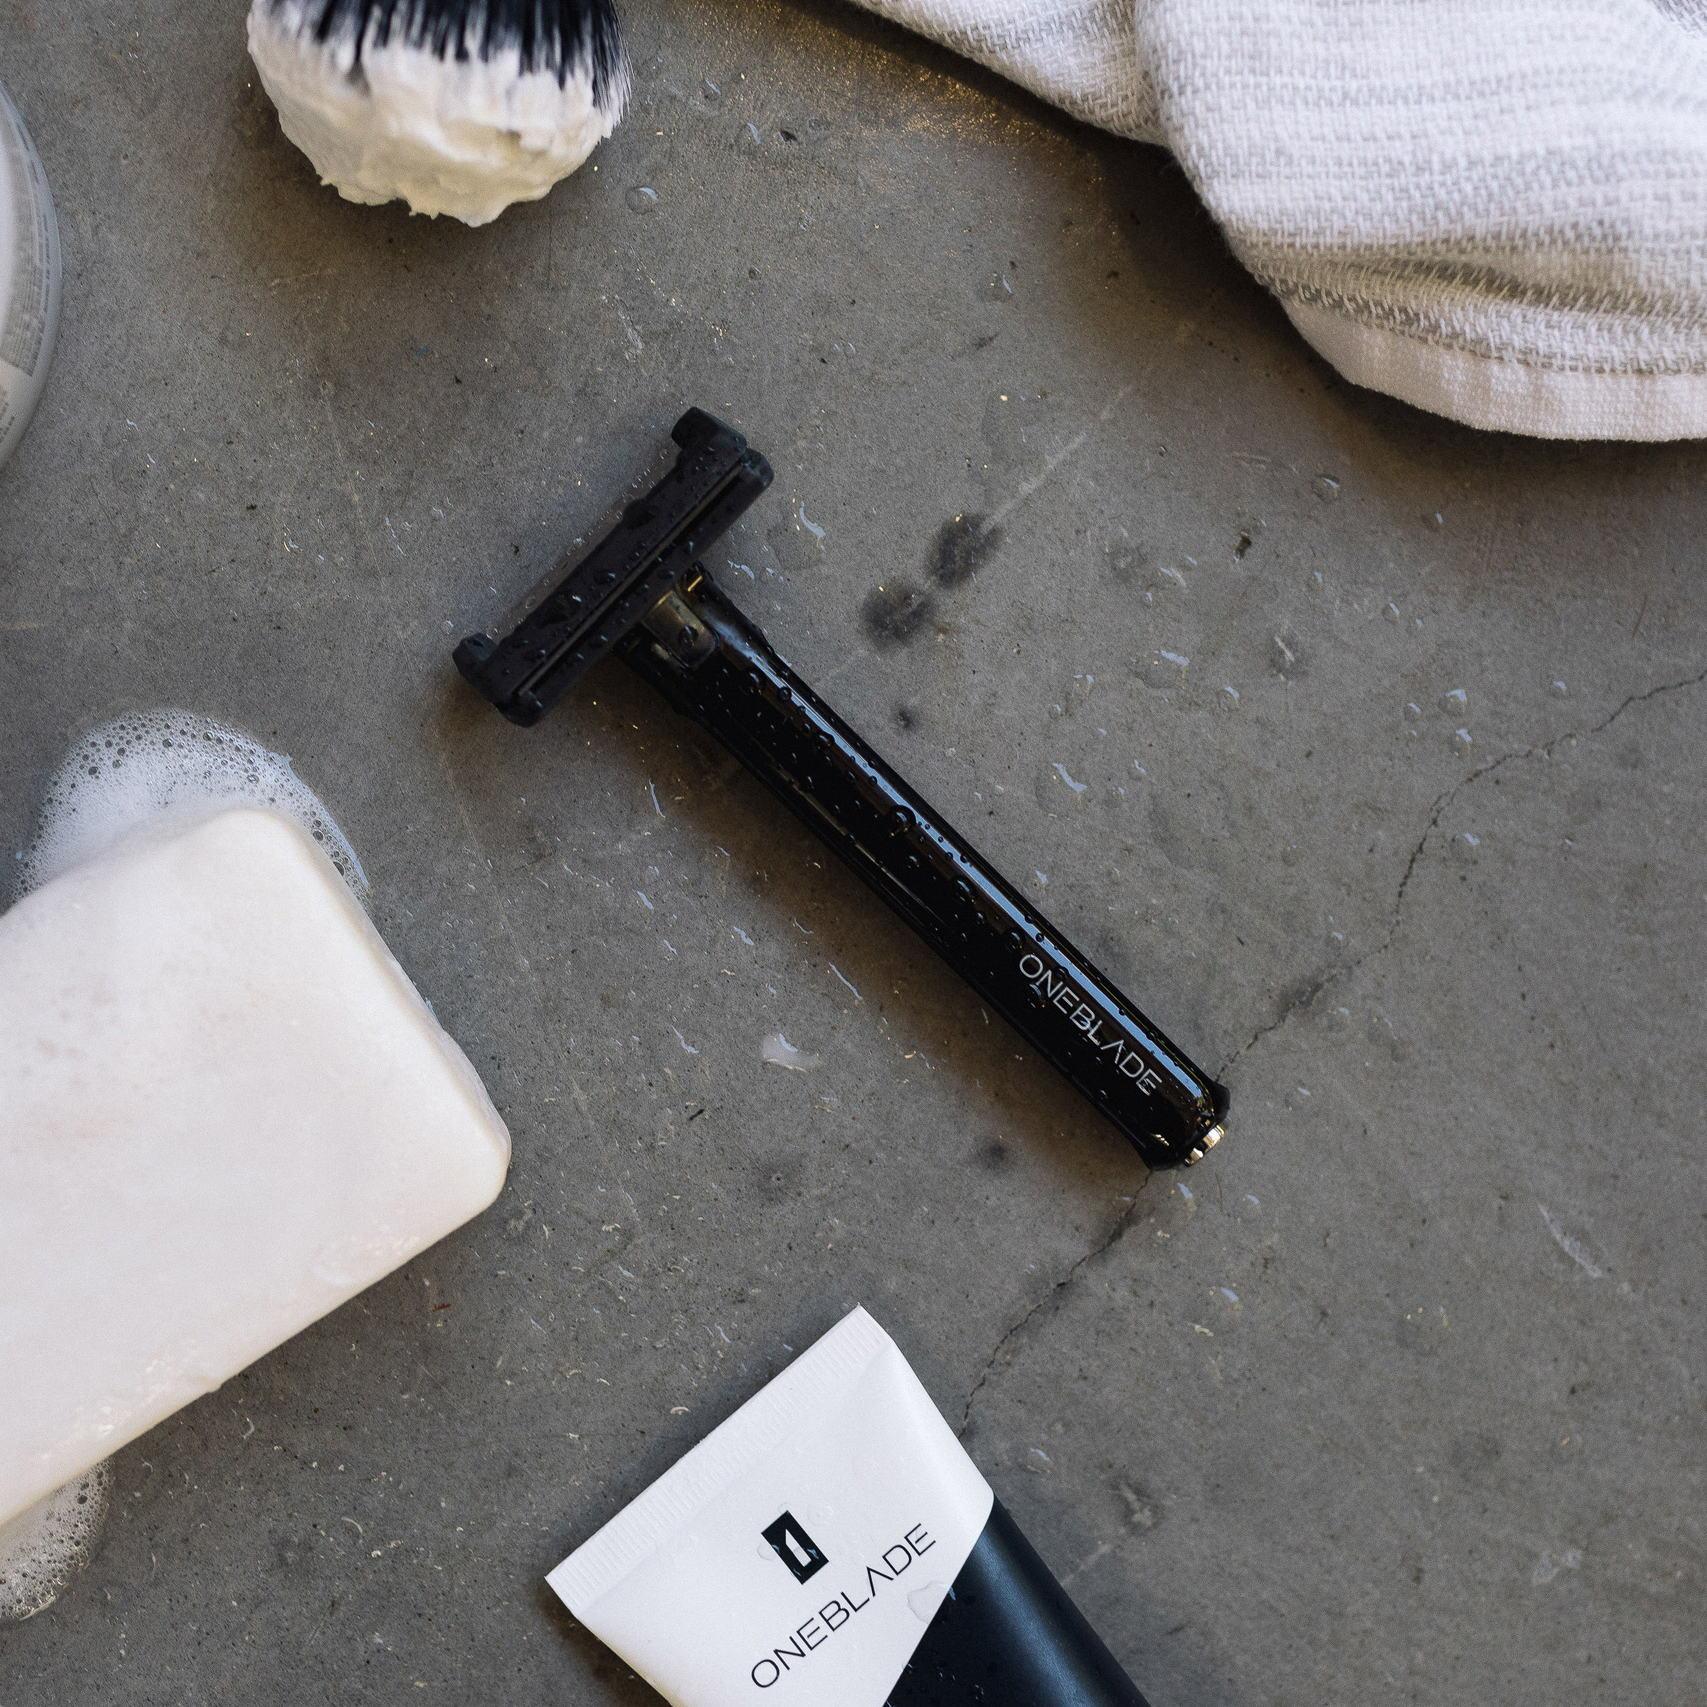 OneBlade razor surrounded by soap, OneBlade shaving cream